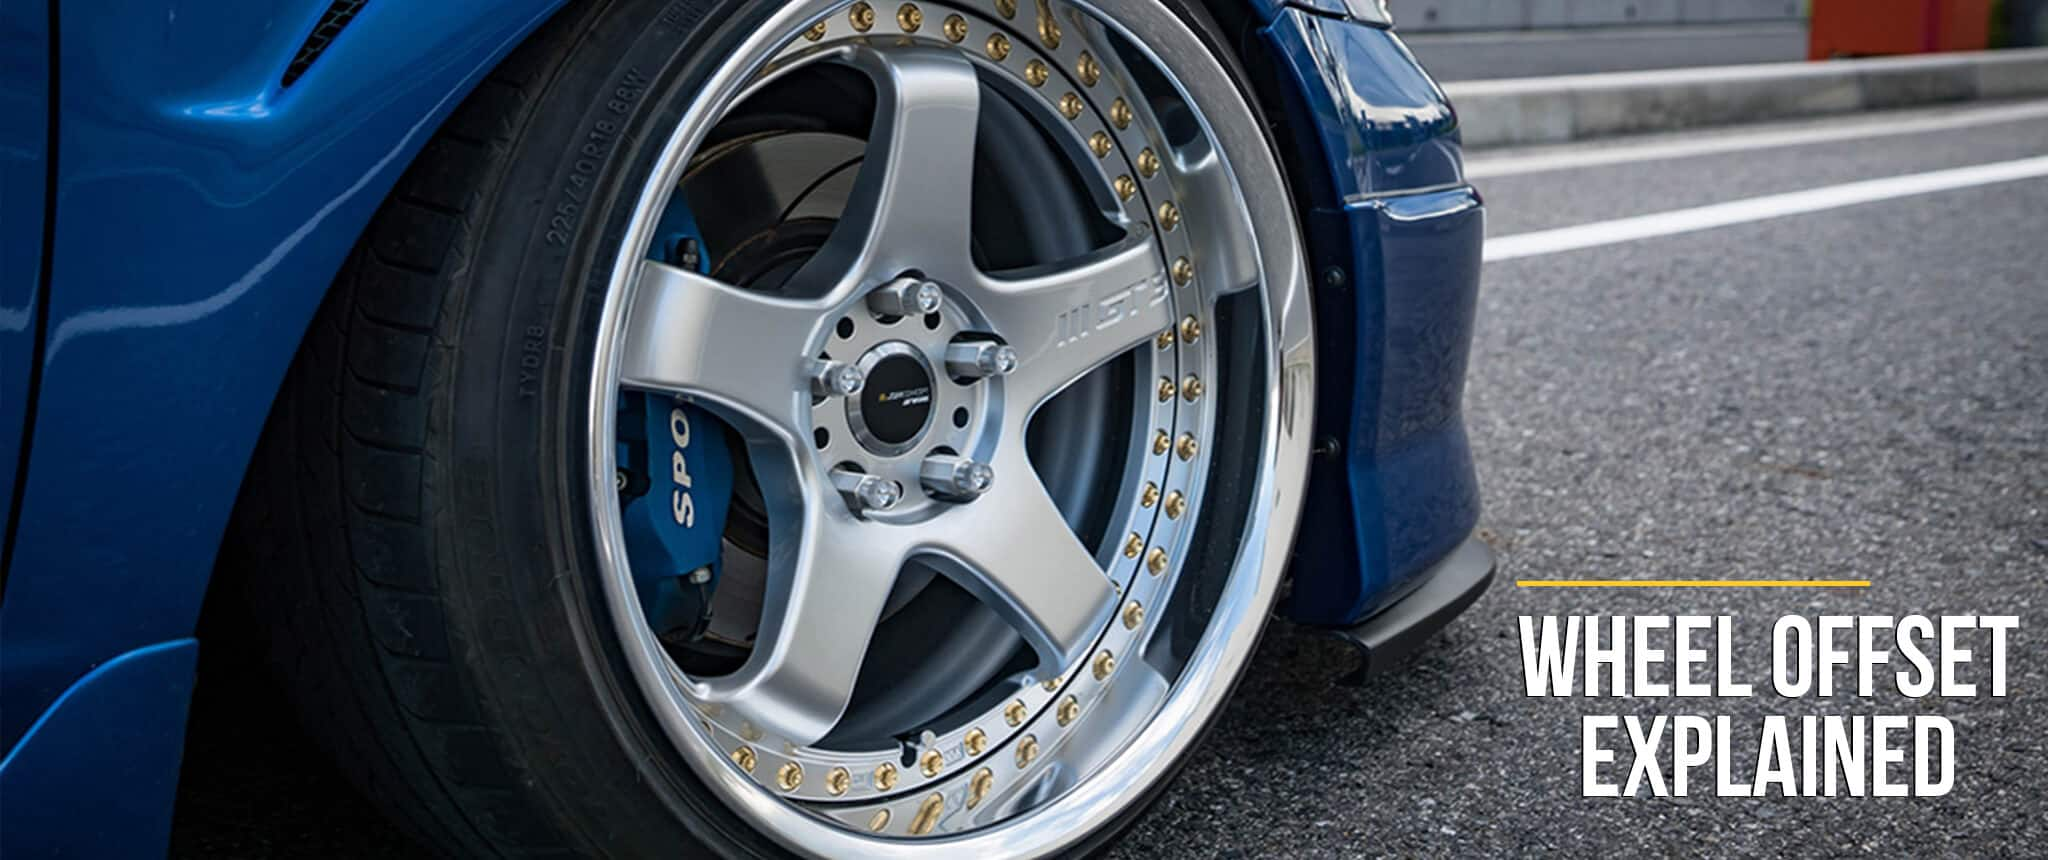 wheel offset explained